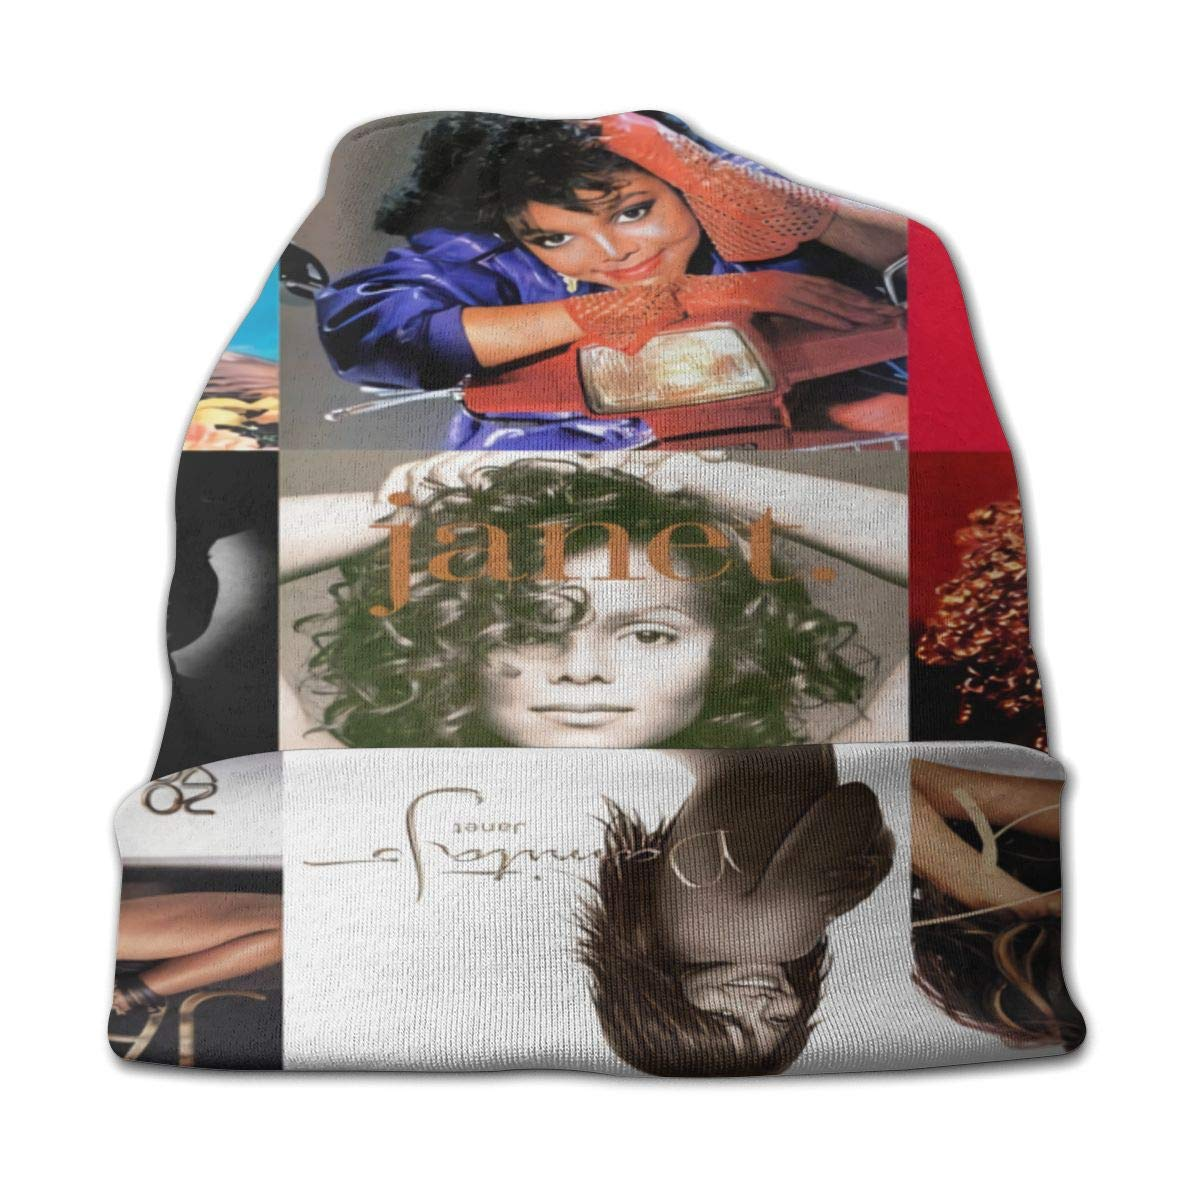 MORGAN MYERS Janet Jackson Adult Knit Hats Fashion Casual Beanie Hat 3D Pattern Skull Cap Unisex Knit Cap Black